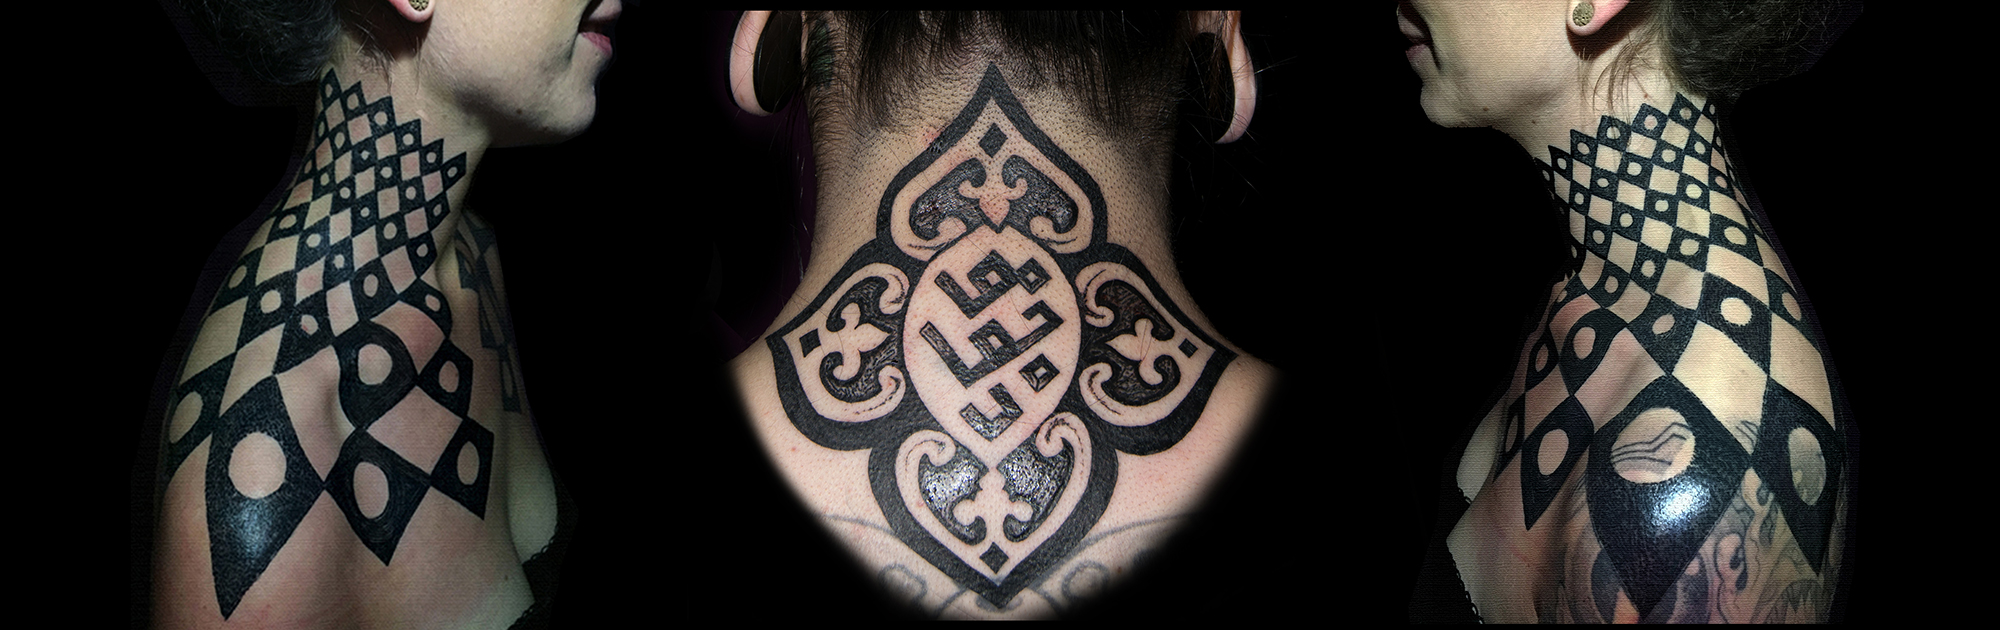 Touka Voodoo's tattoo work